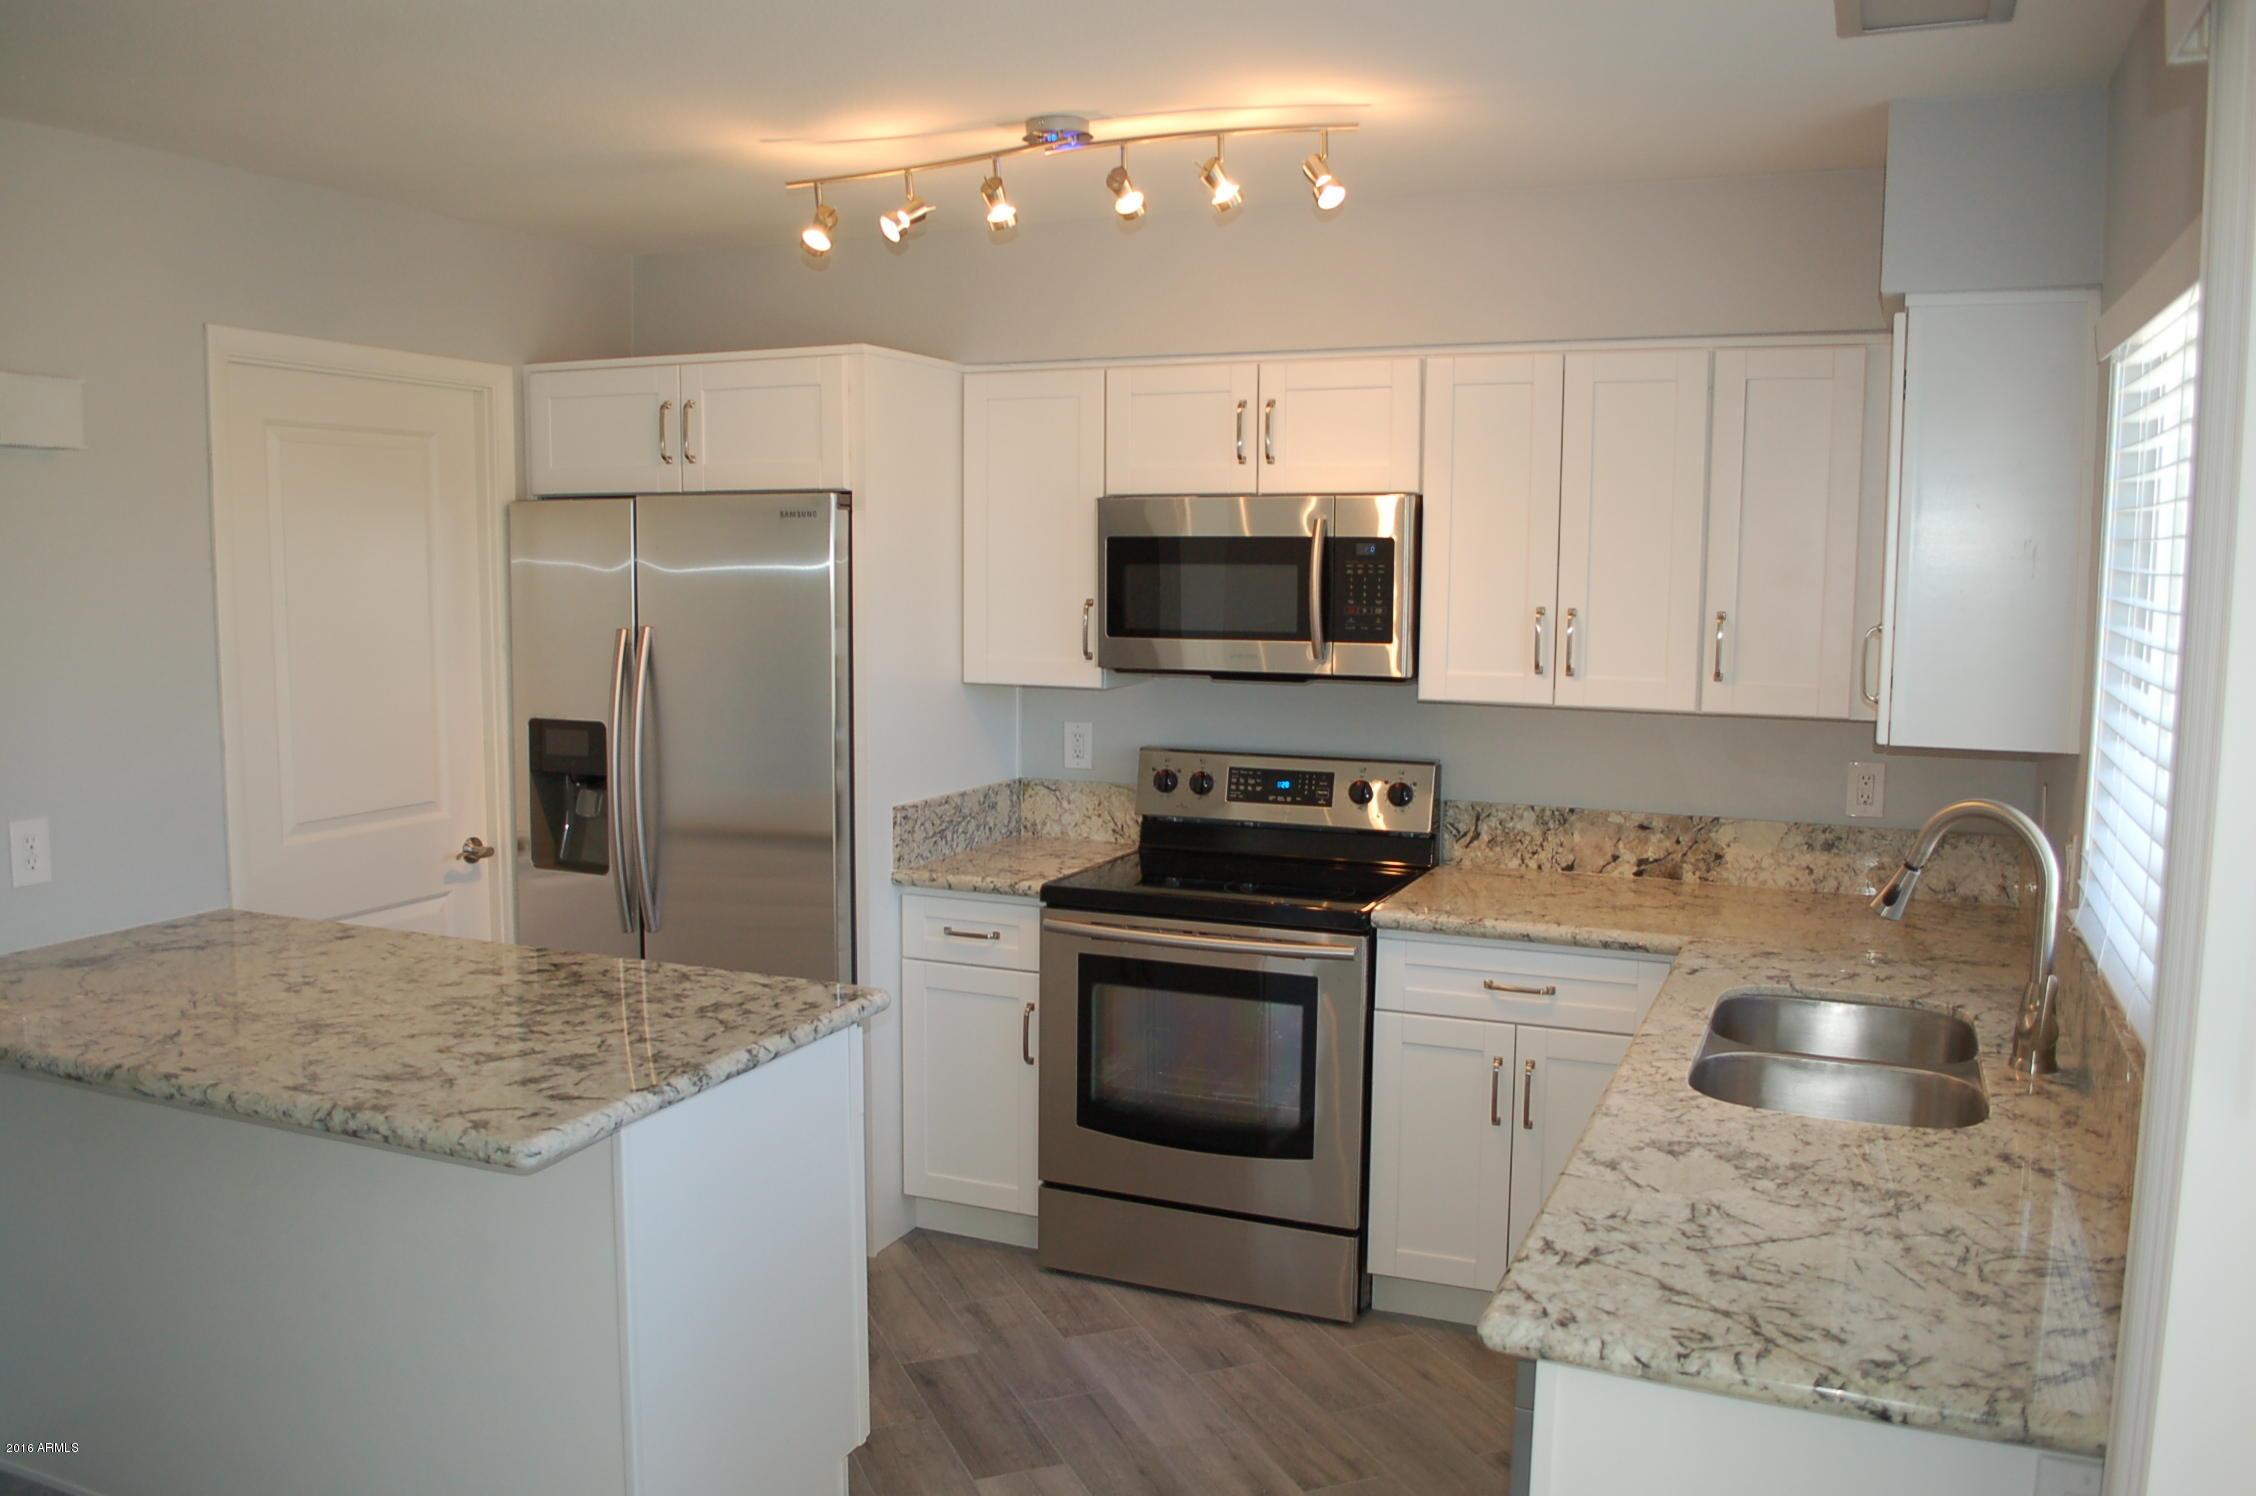 5851 N 81st  Street  Scottsdale AZ 85250